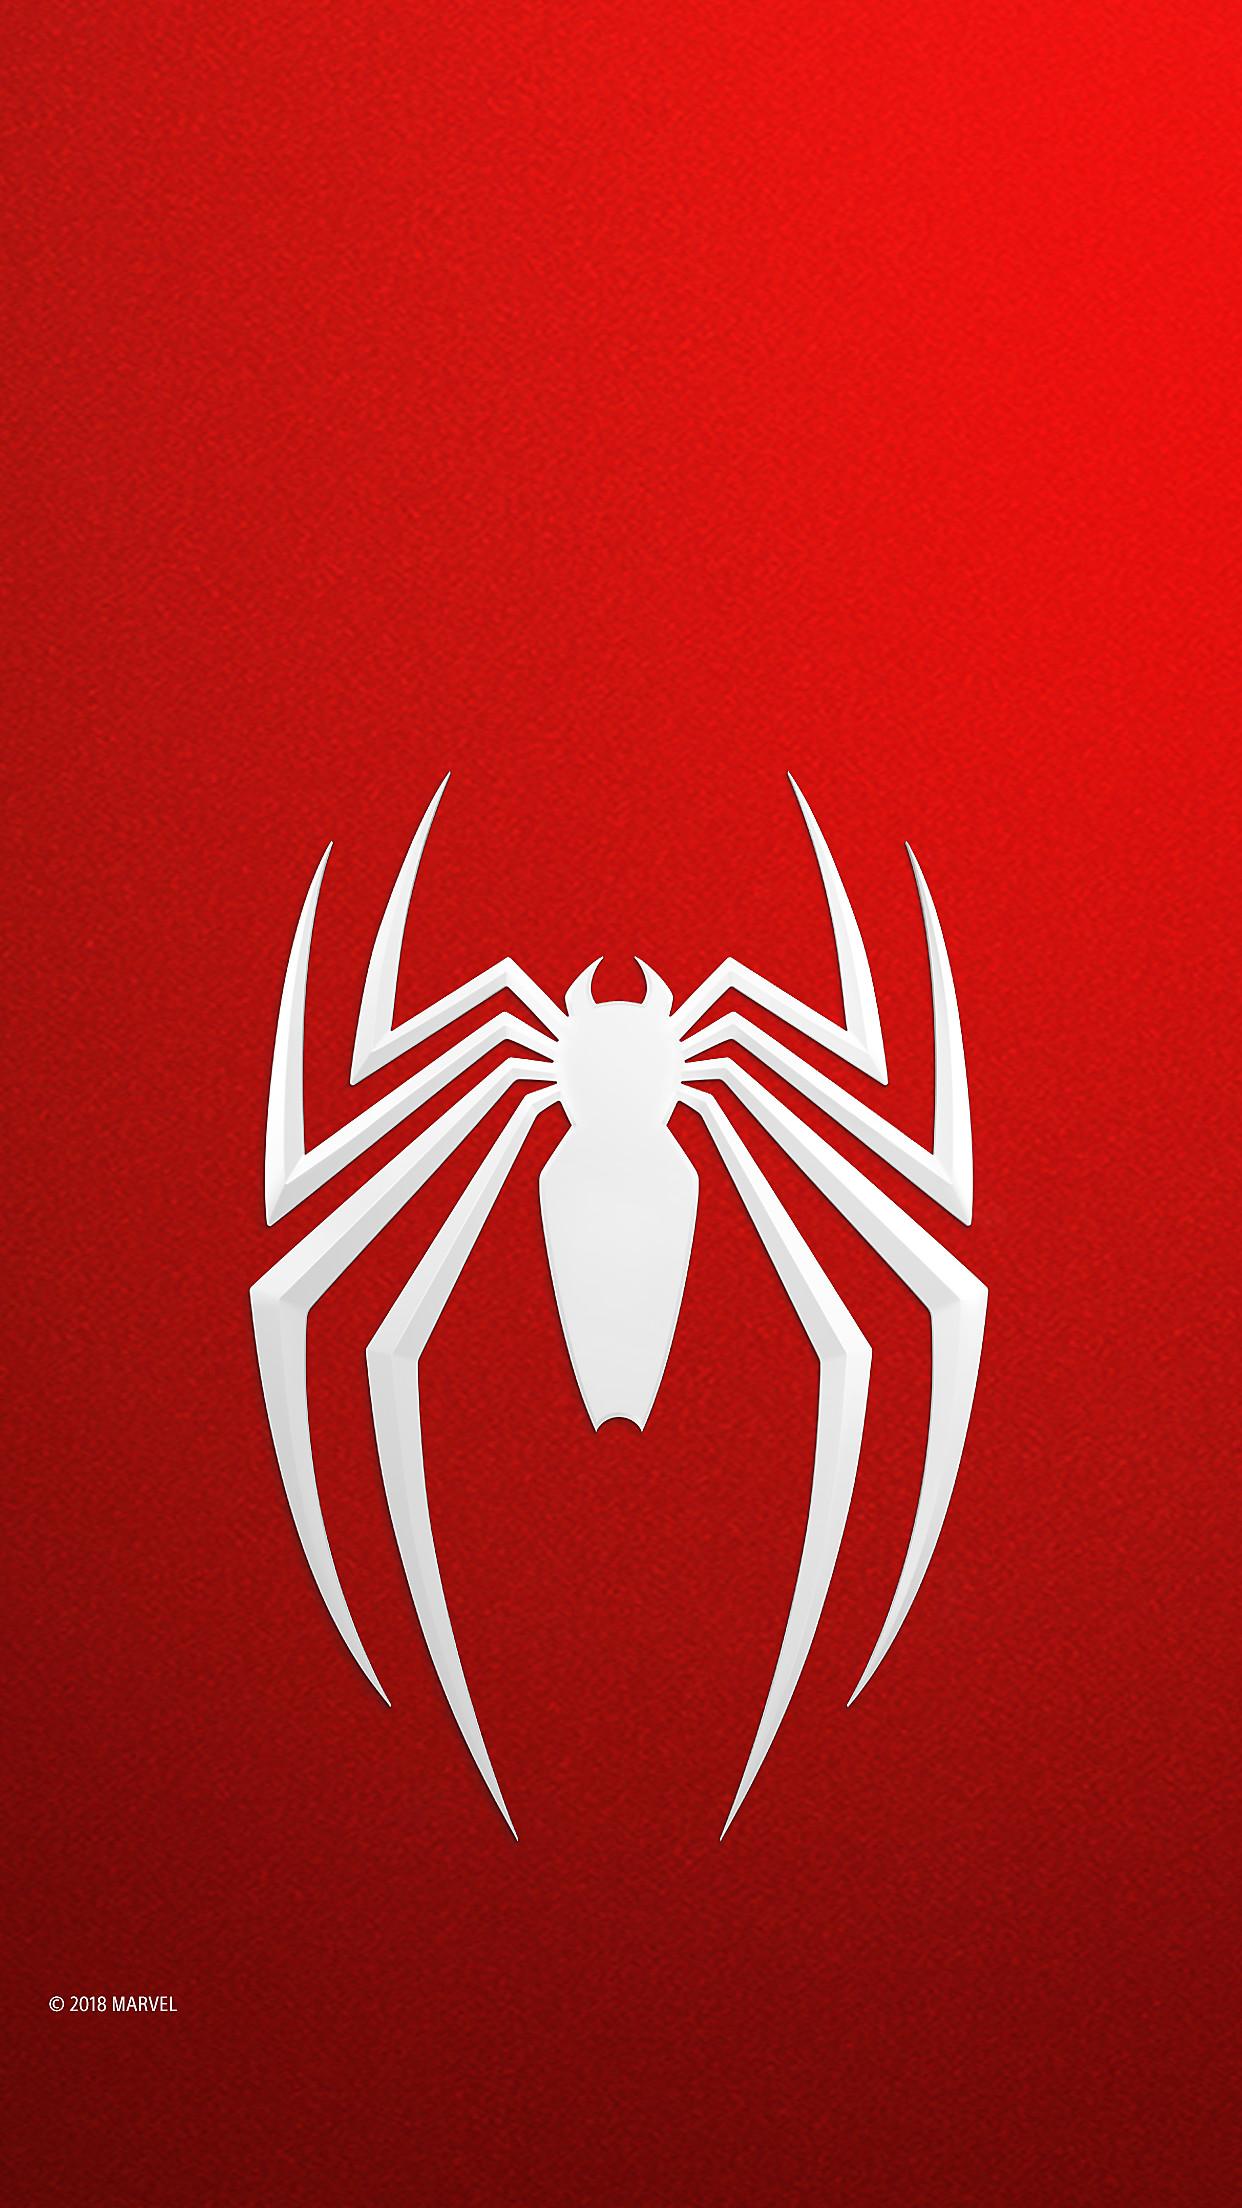 Marvel S Spider Man Game Playstation